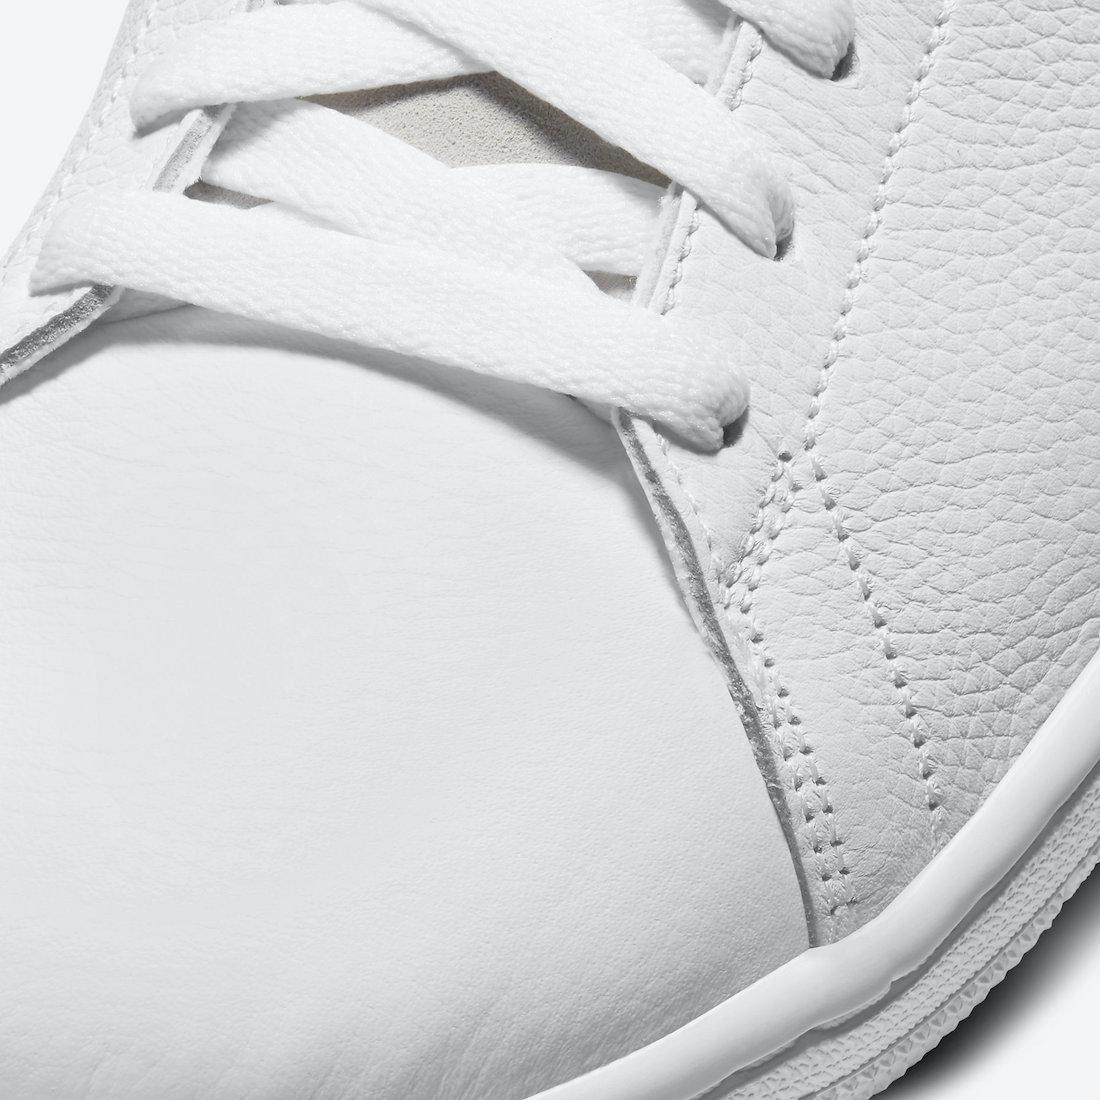 Jordan-Centre-Court-White-DJ2756-100-Release-Date-6